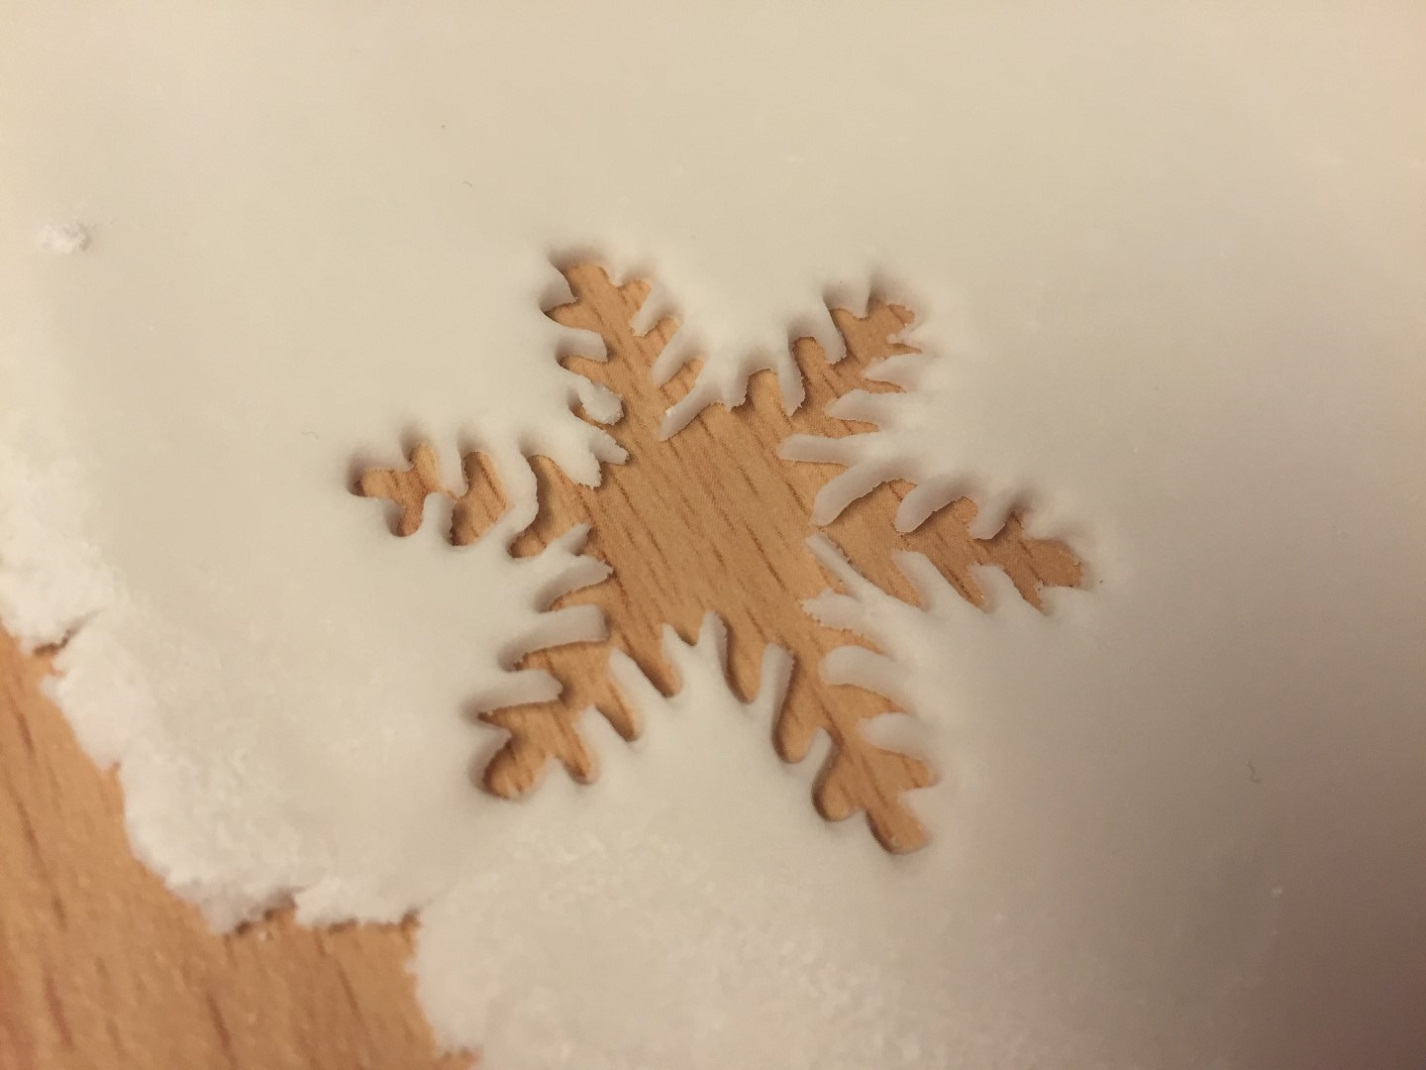 Snowflake Hole in Fondant